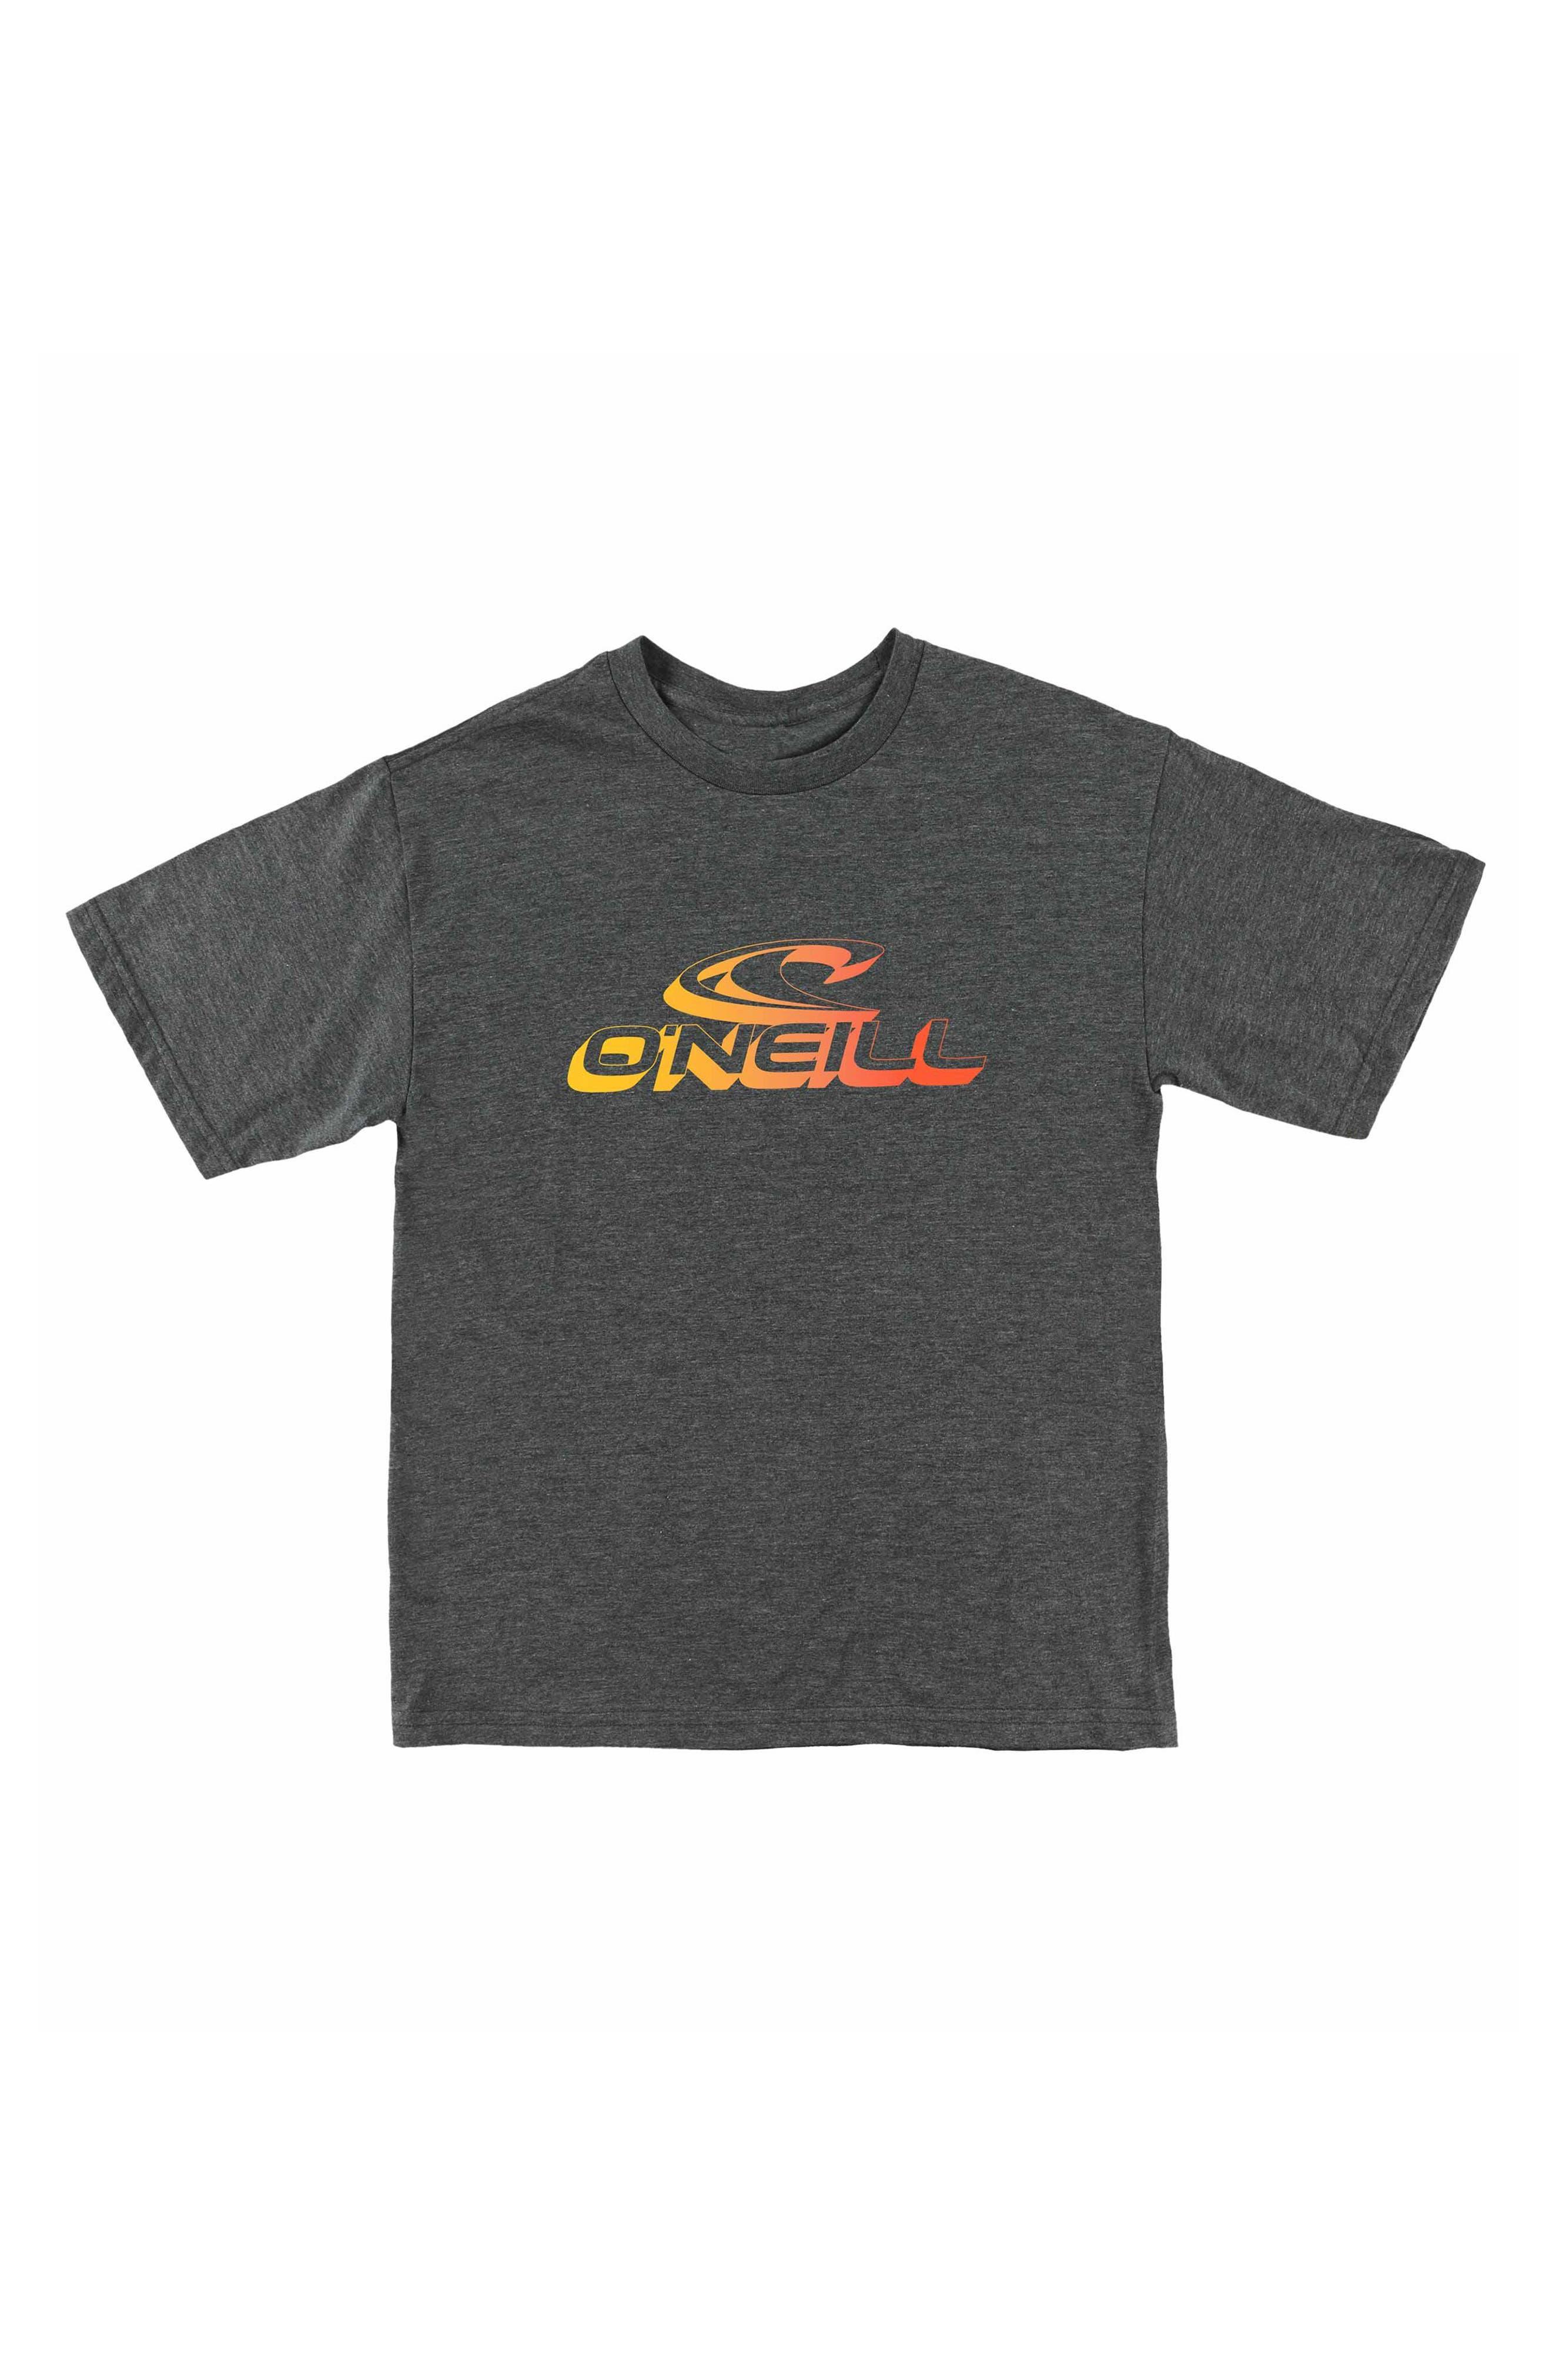 O'Neill Extra T-Shirt (Toddler Boys & Little Boys)